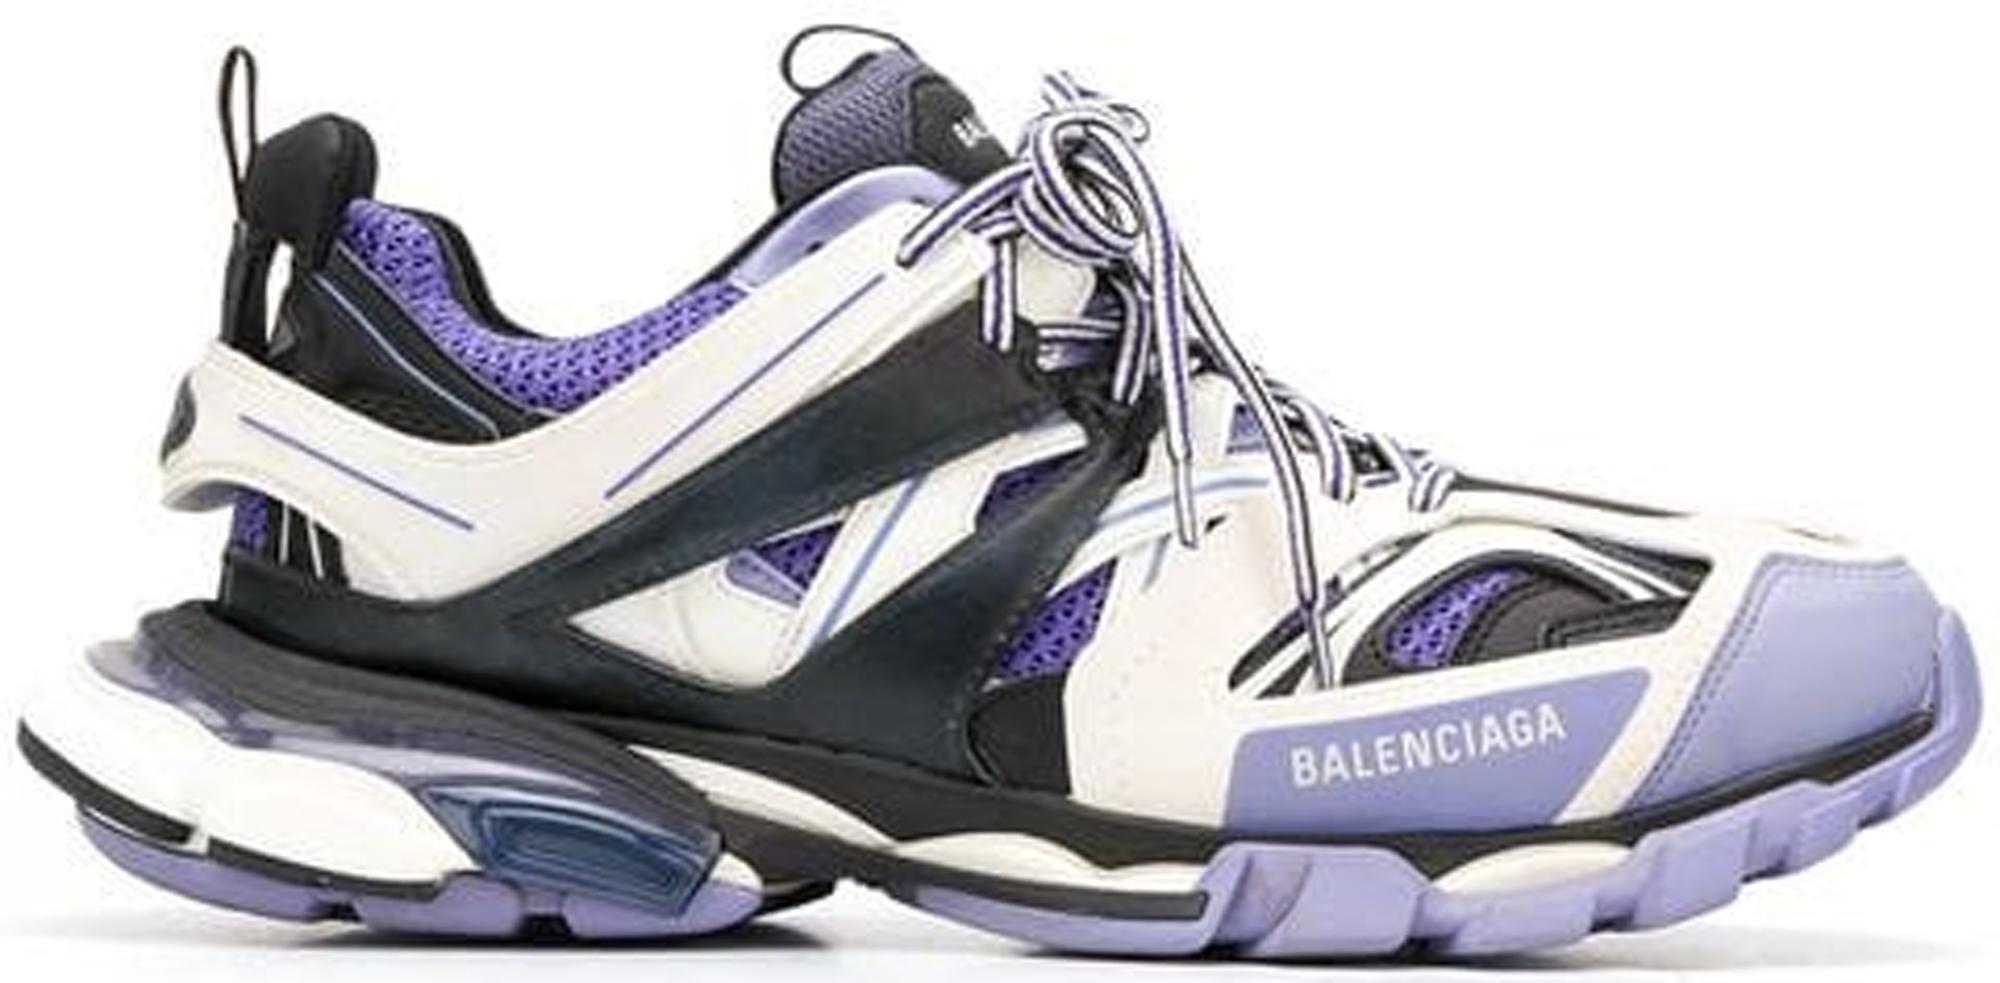 Balenciaga Track trainers in white and orange Pinterest